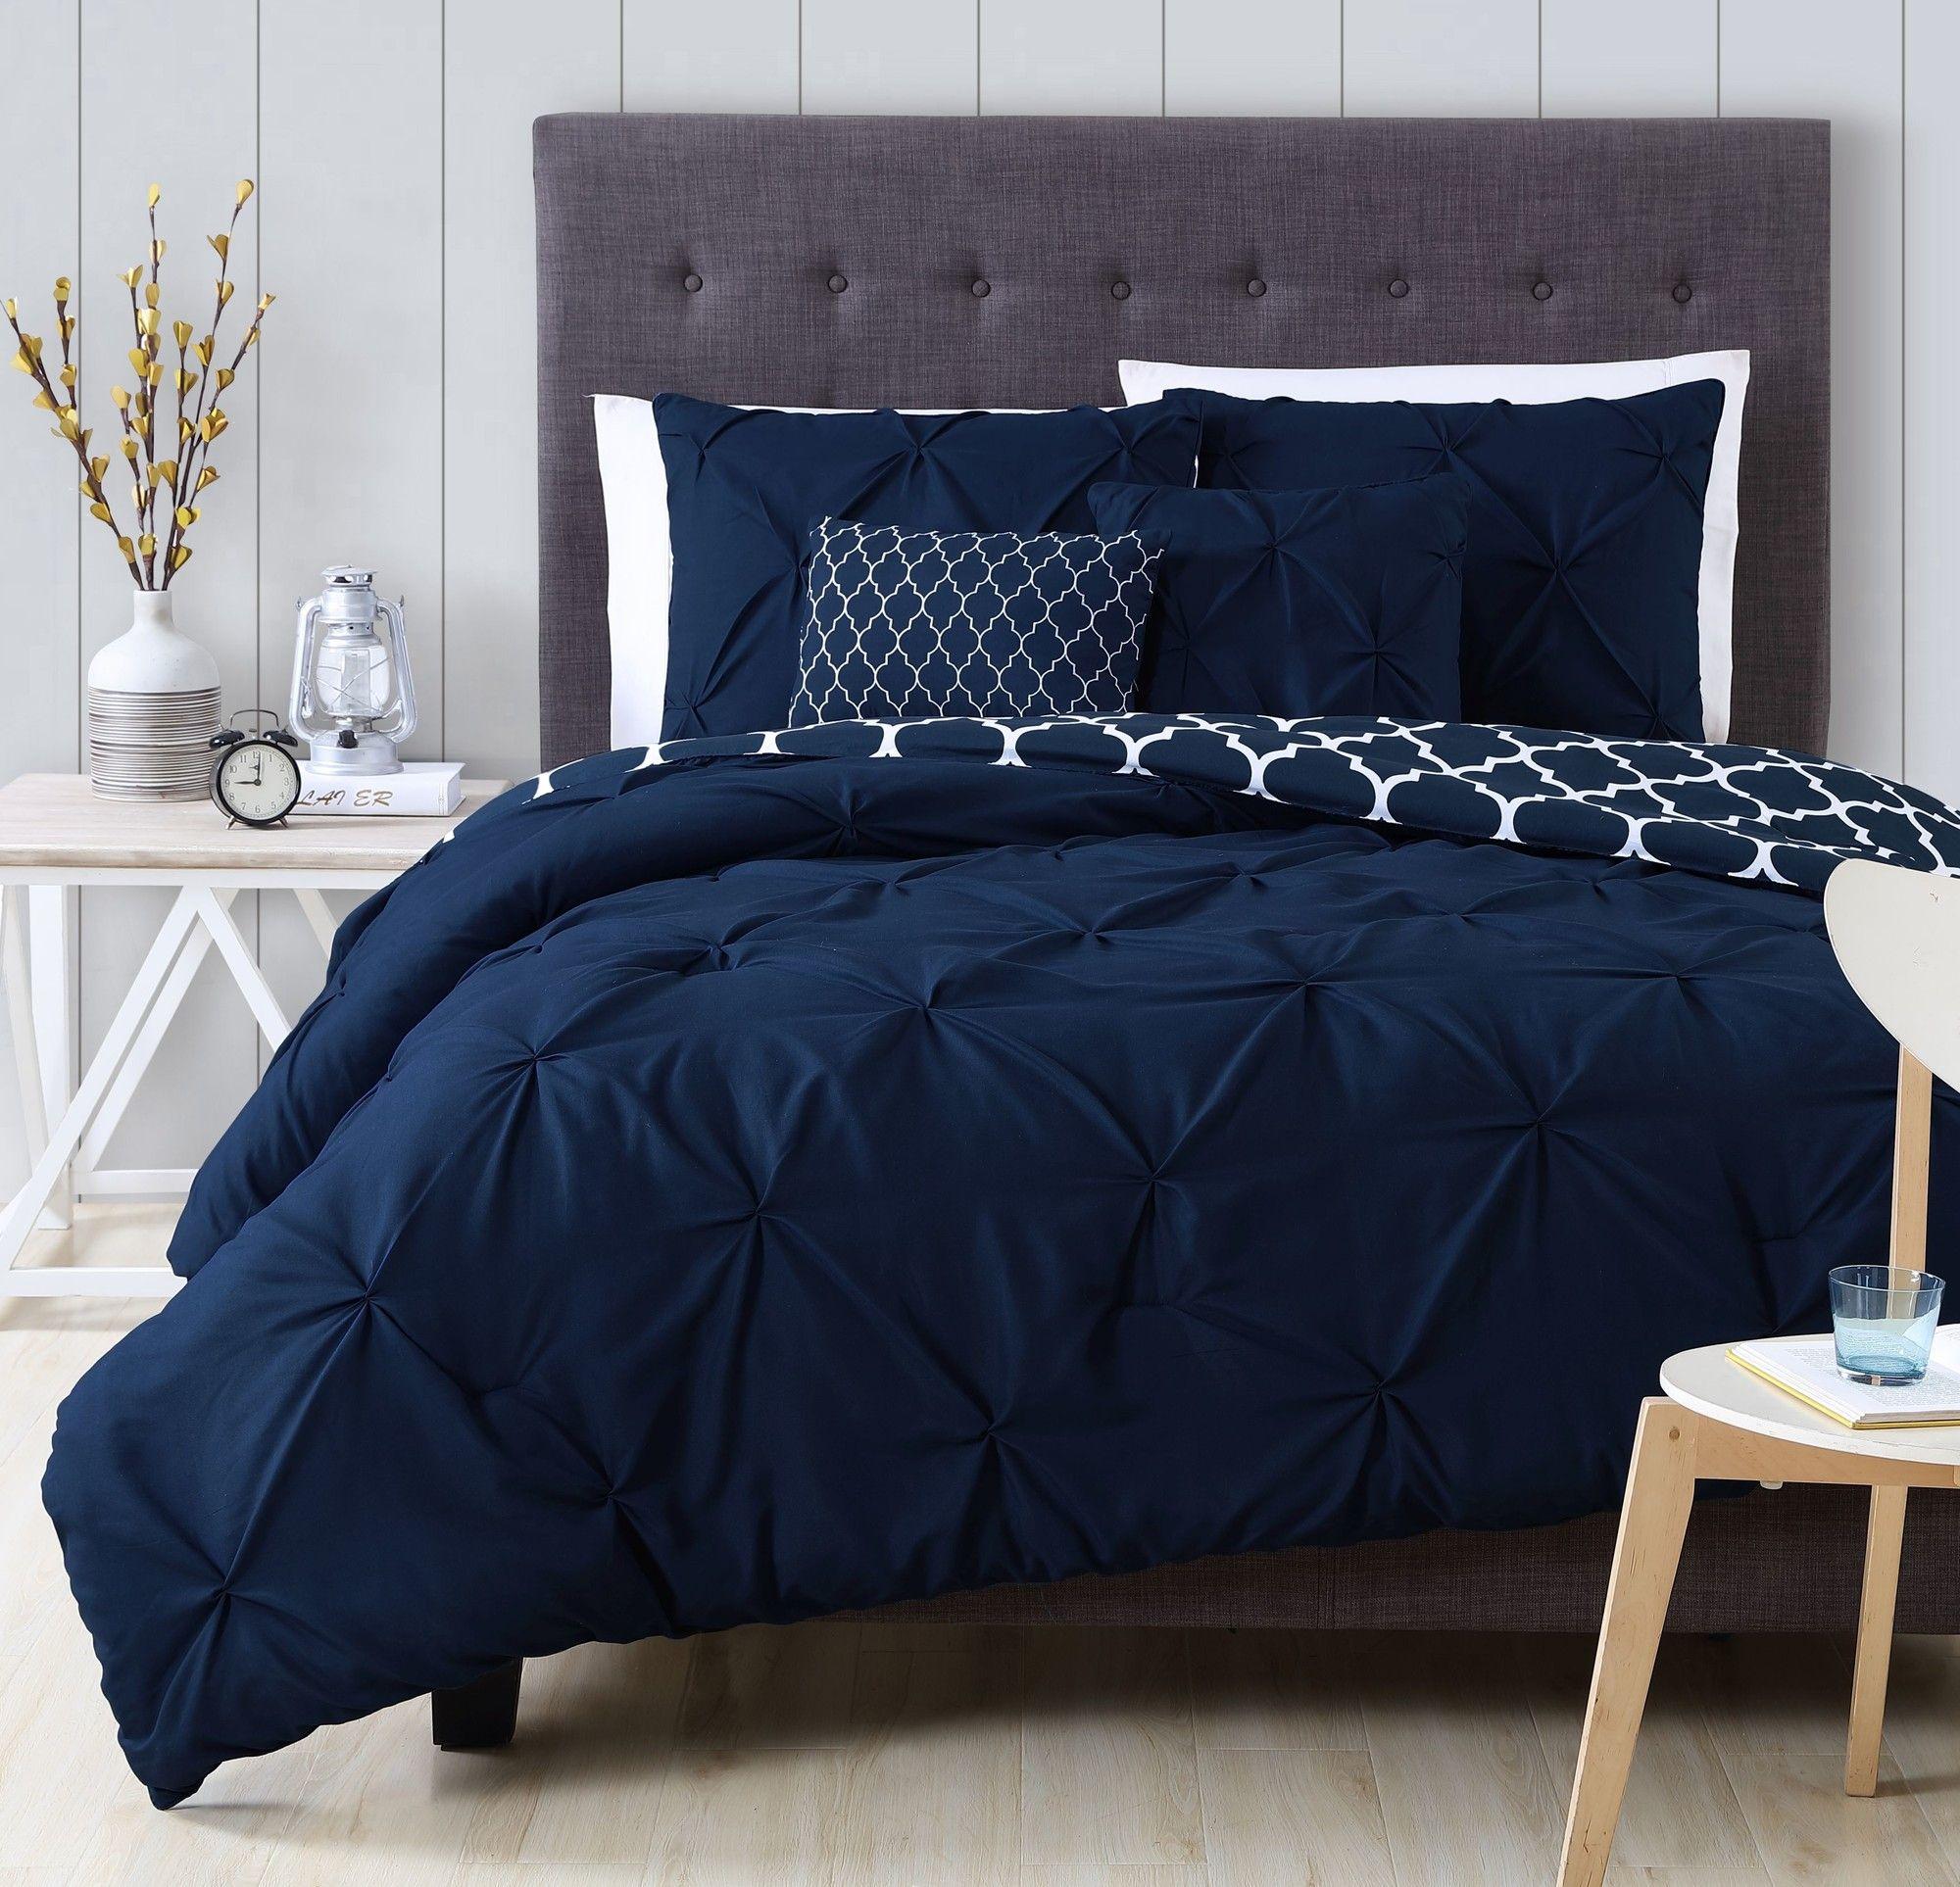 Best Geneva Home Madrid 5 Piece Comforter Set Allmodern 400 x 300